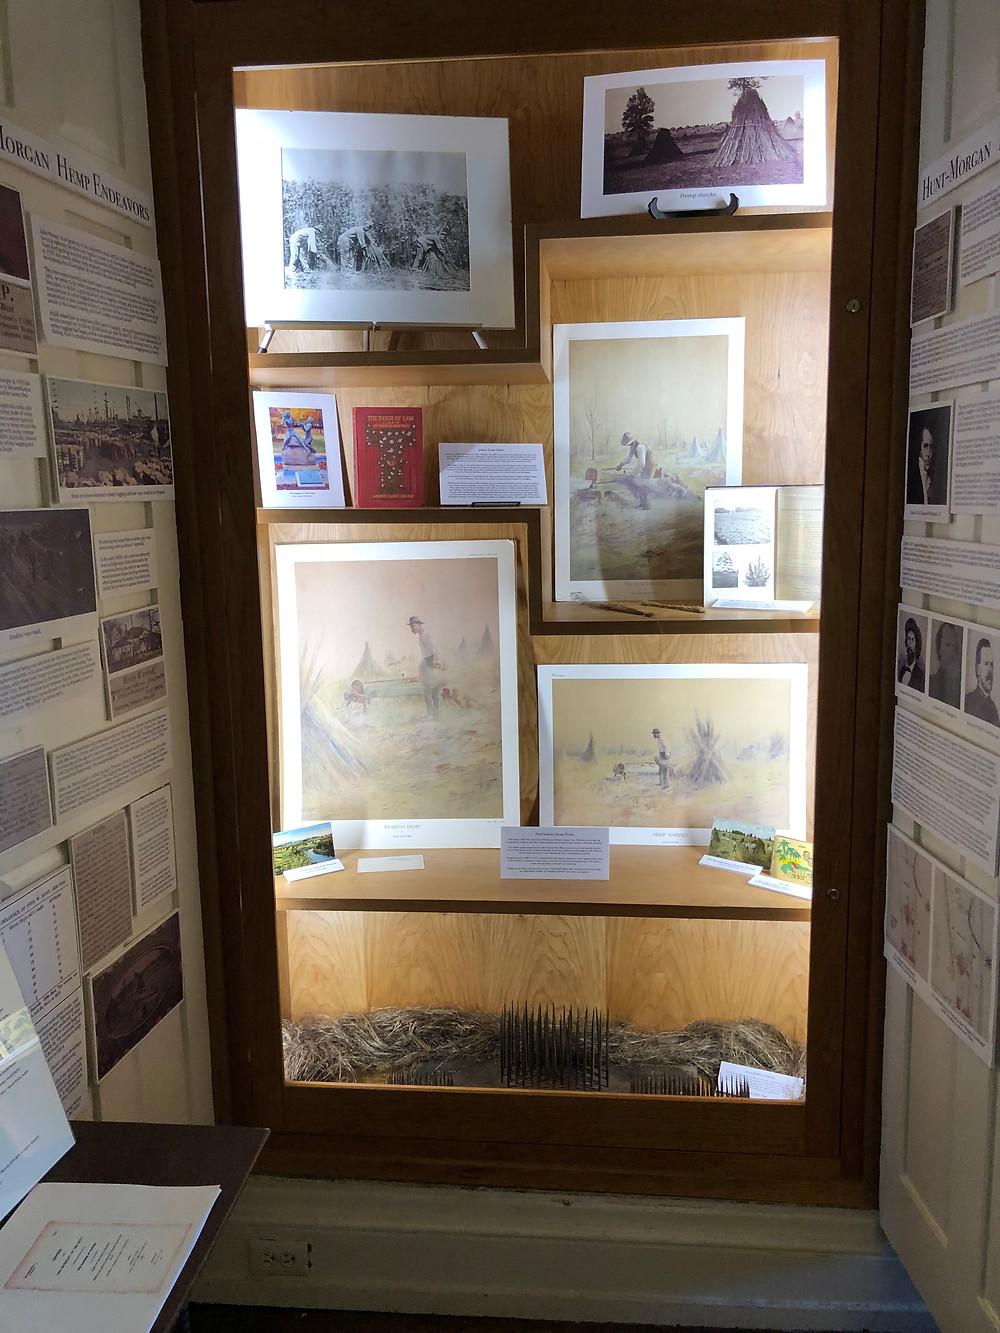 Paul Sawyier Hemp Prints on display at the Kentucky Hemp Museum display at Hopemont, the Hunt-Morgan House in Lexington, Kentucky.